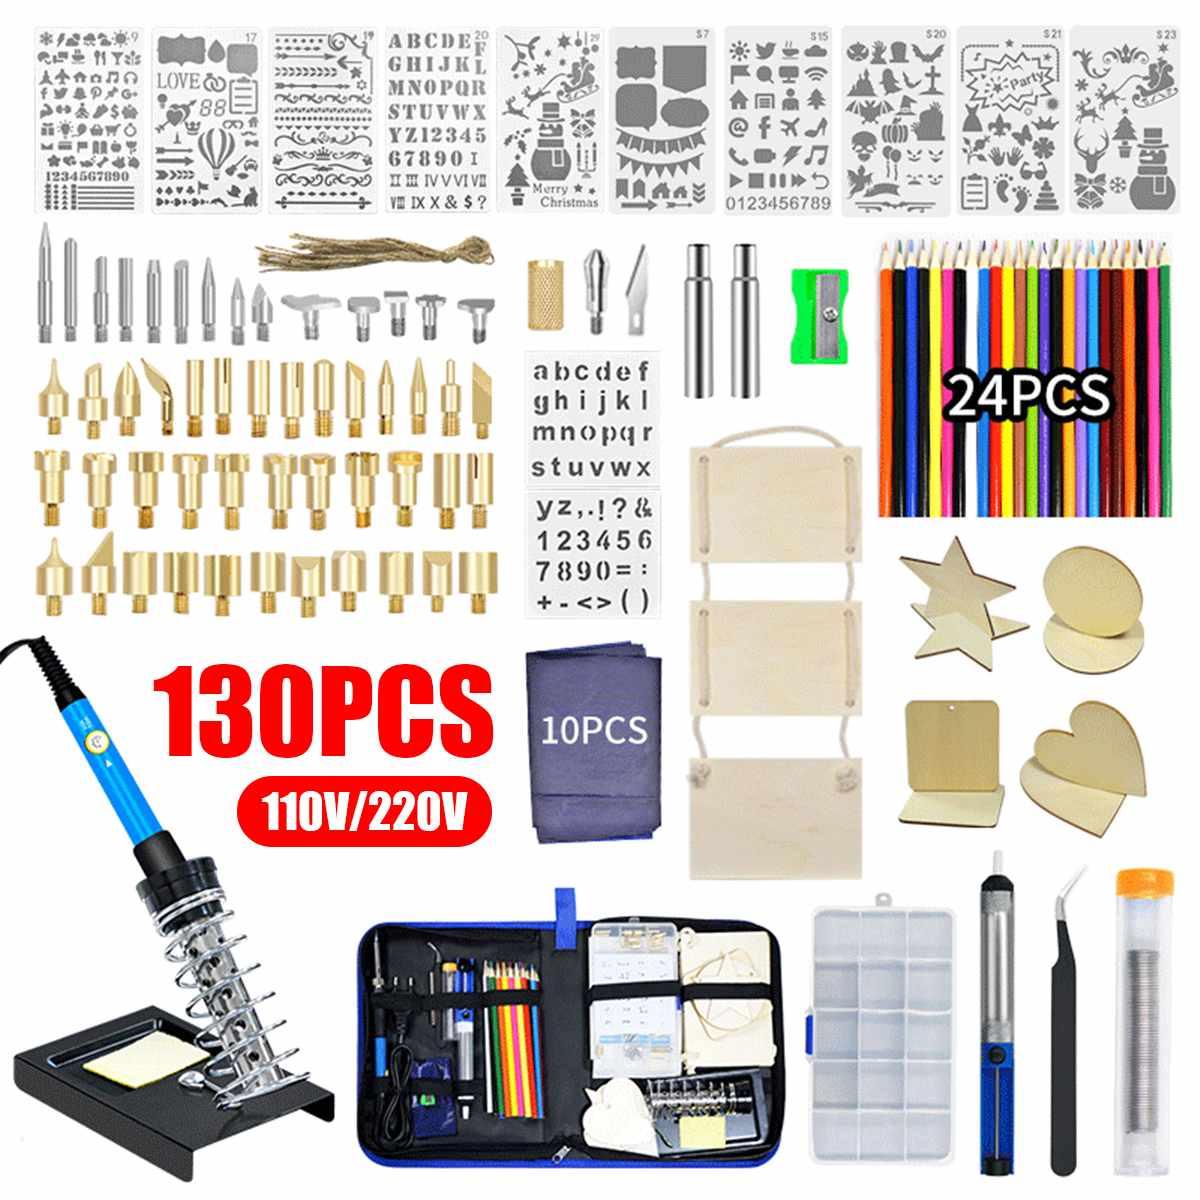 130PCS 220V 110V 60W DIY Adjustable Temperature Electric Soldering Iron Welding Kit